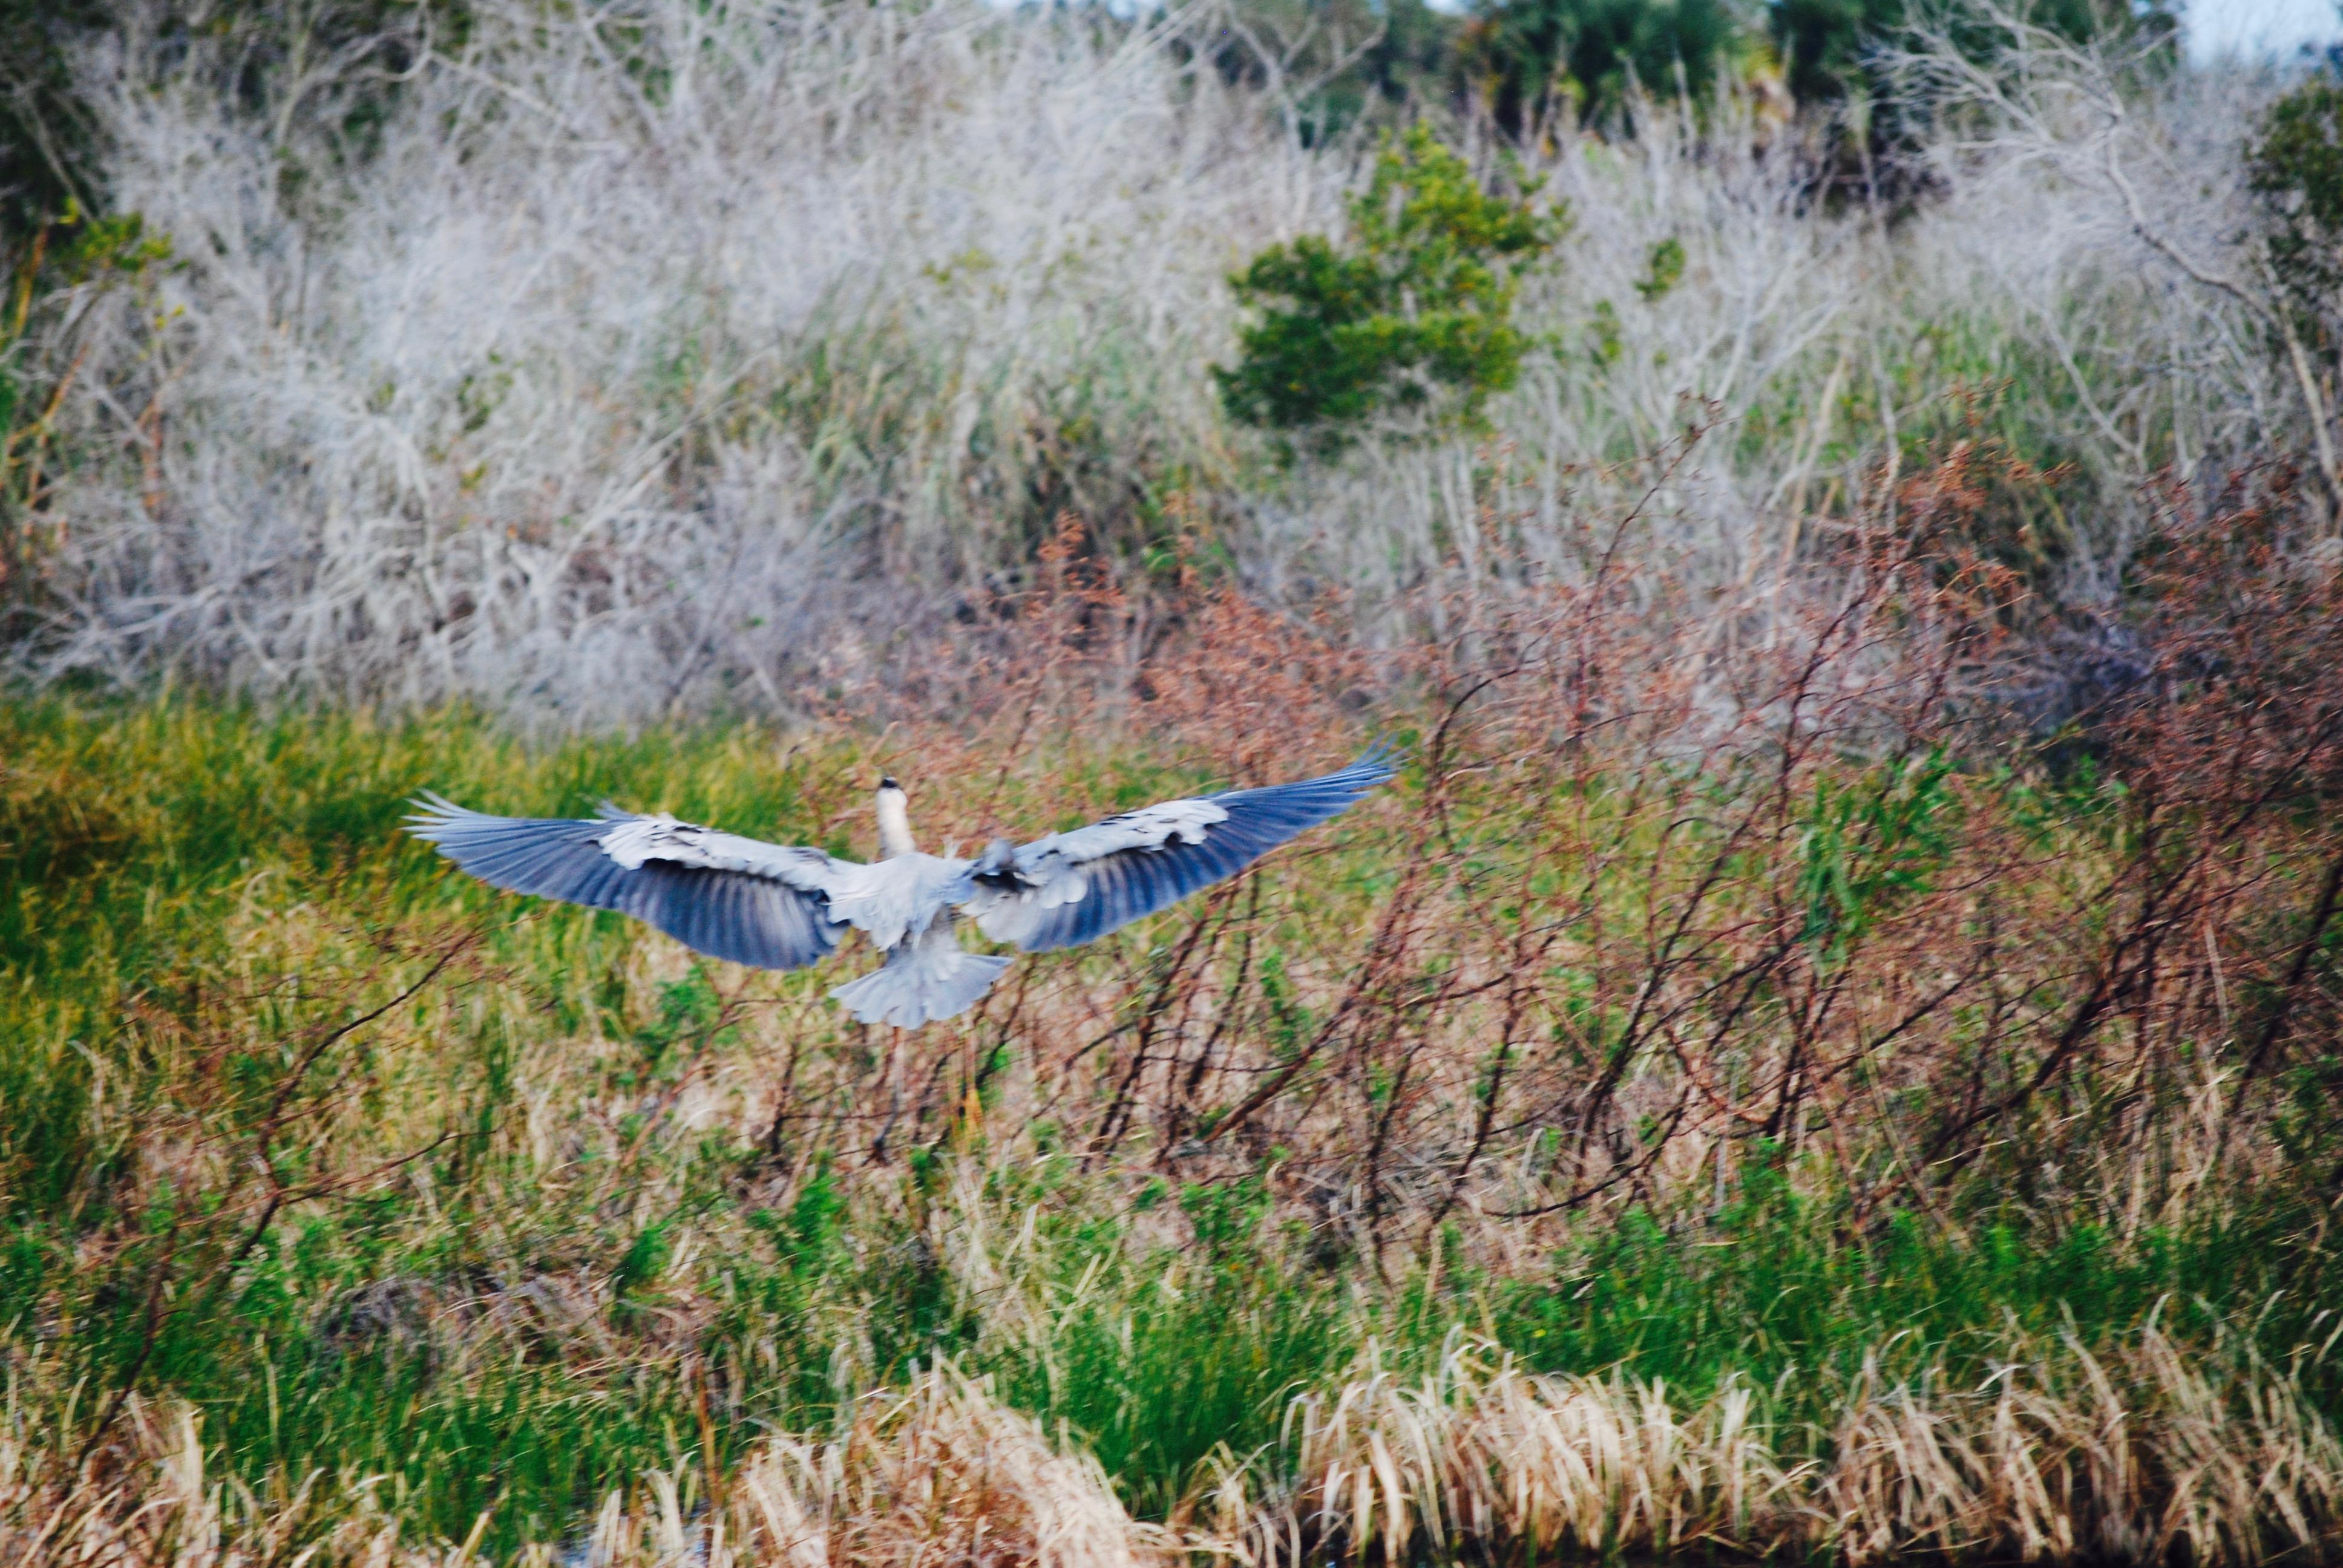 Blue Heron at the Savannas Recreation Area in Ft Pierce